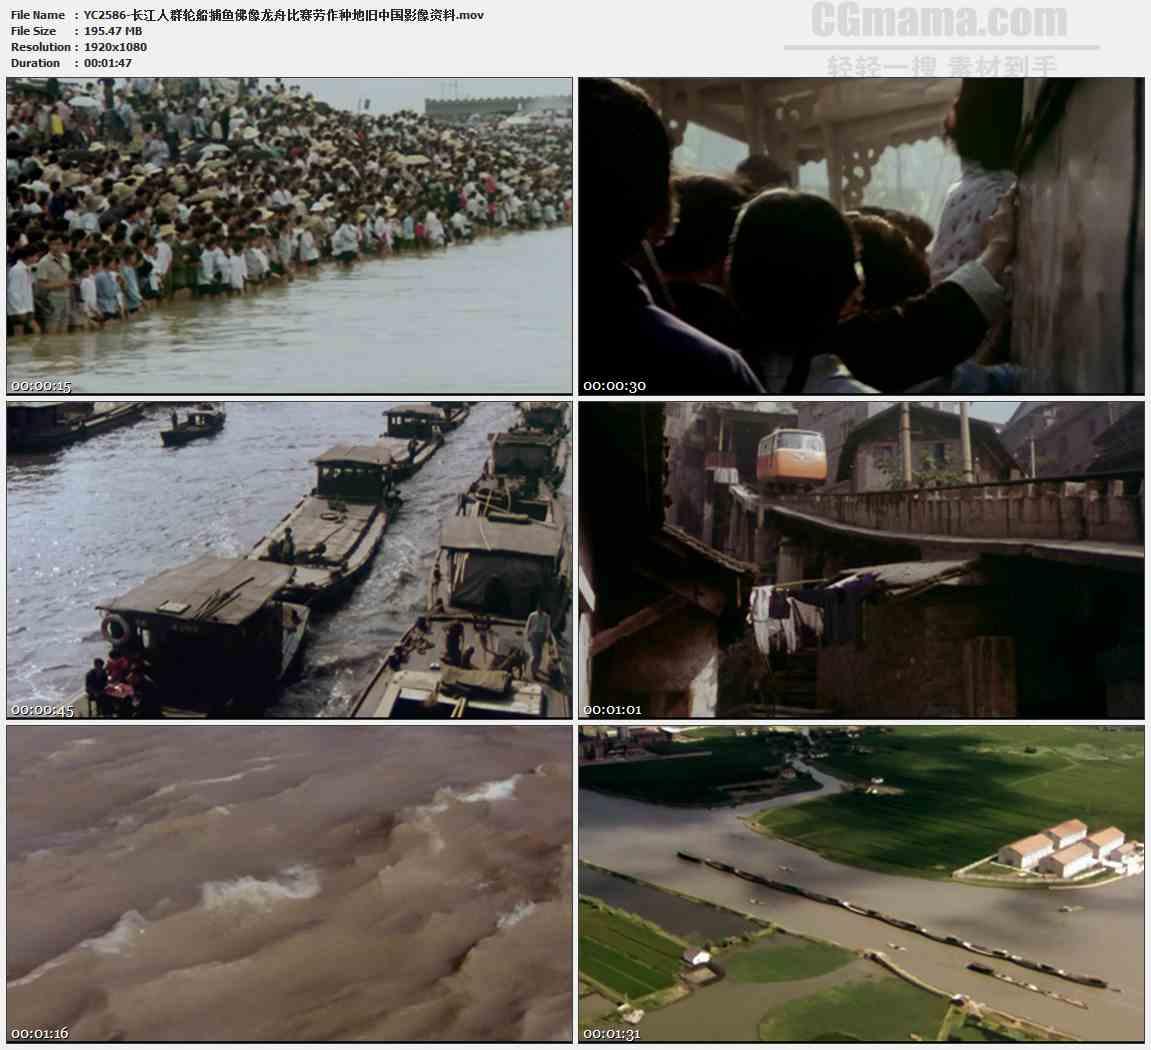 YC2586-长江人群轮船捕鱼佛像龙舟比赛劳作种地旧中国影像资料高清实拍视频素材